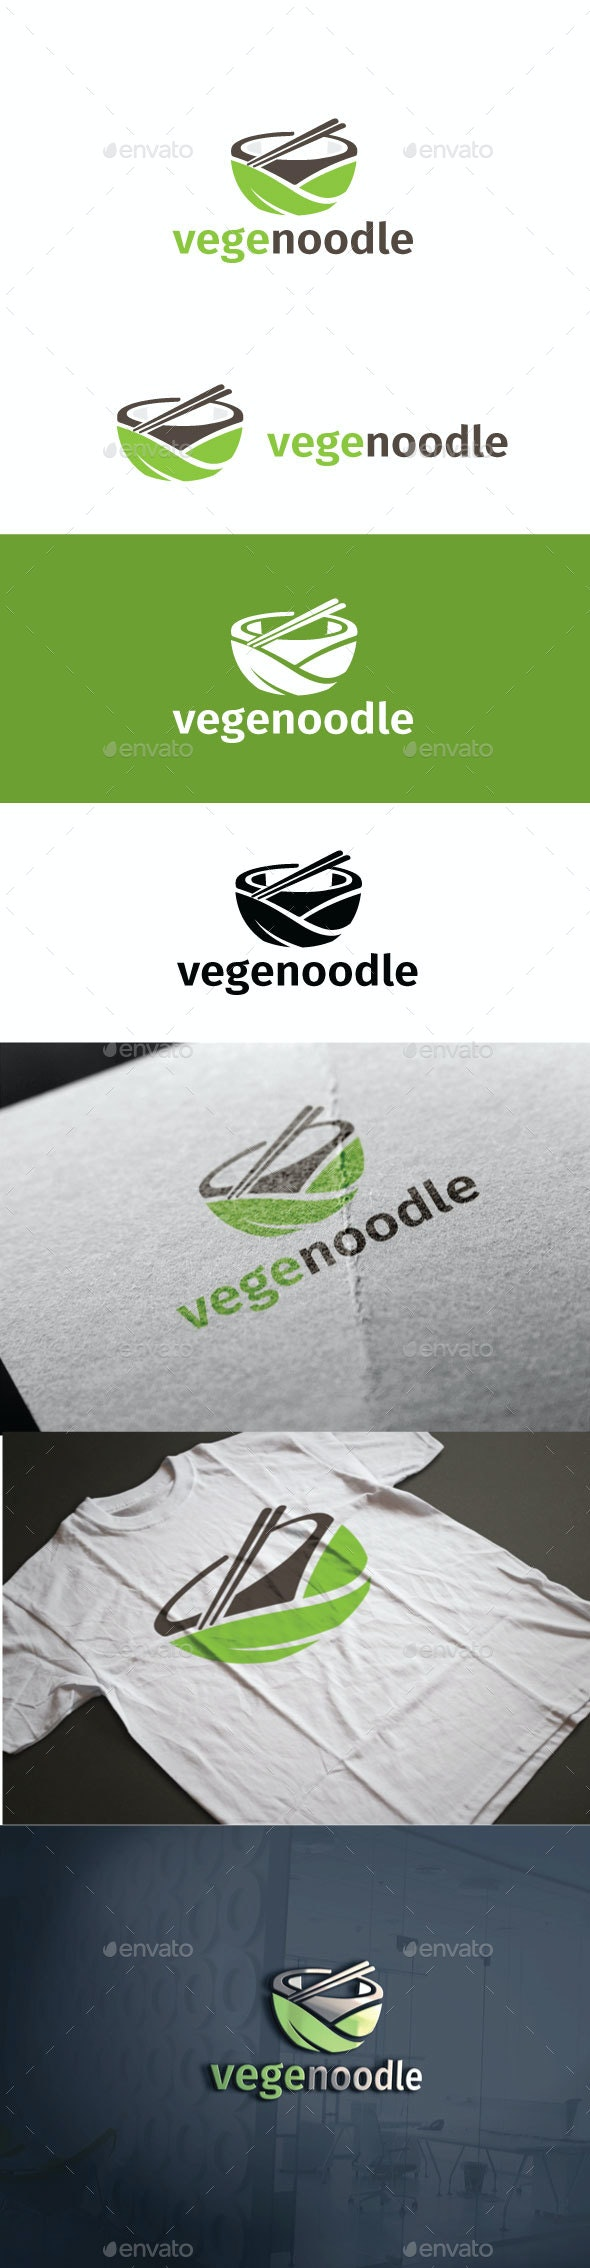 Vegenoodle Logo - Food Logo Templates